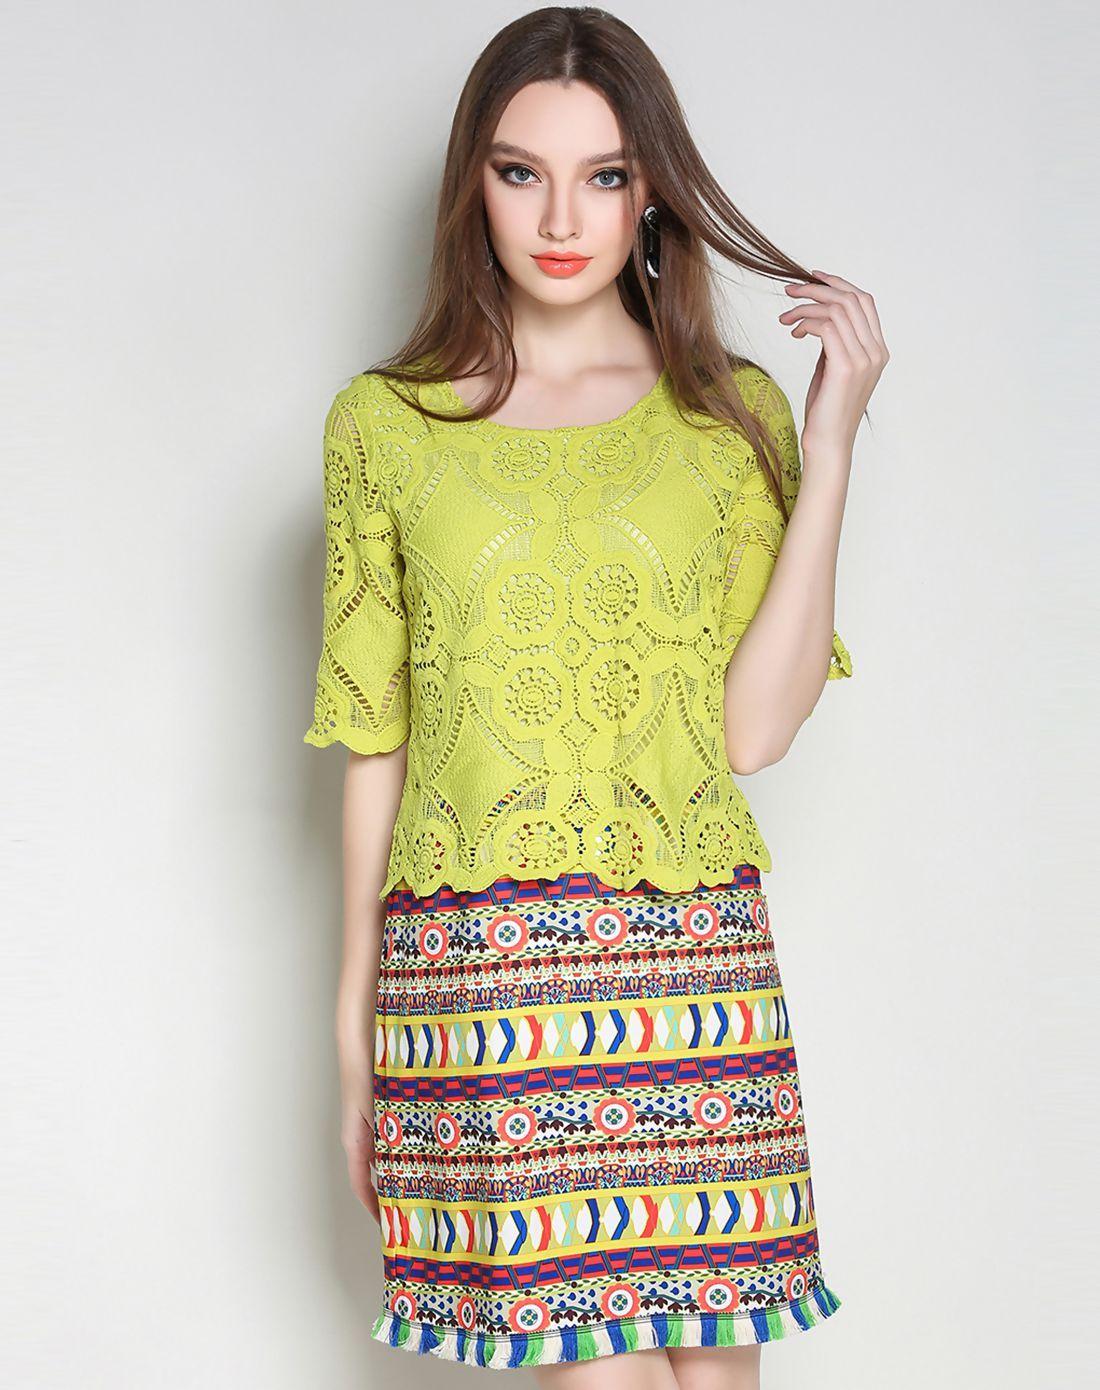 Adorewe vipme aline dresses designer mingysyi yellow plus size